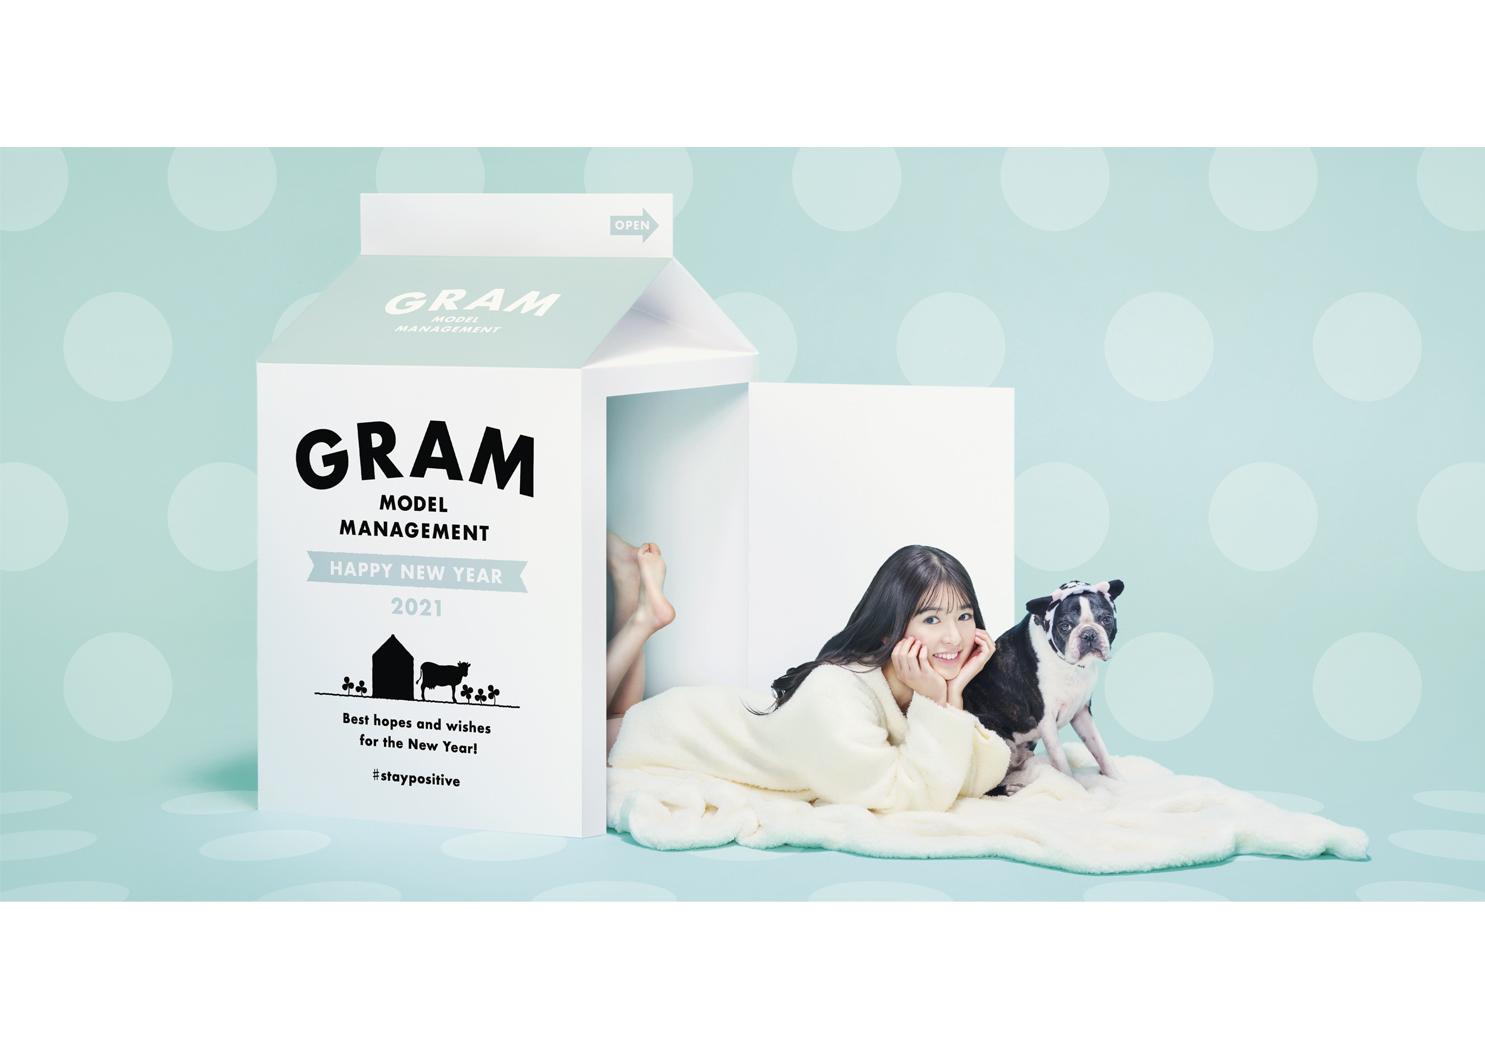 GRAM New Year's Card 2021